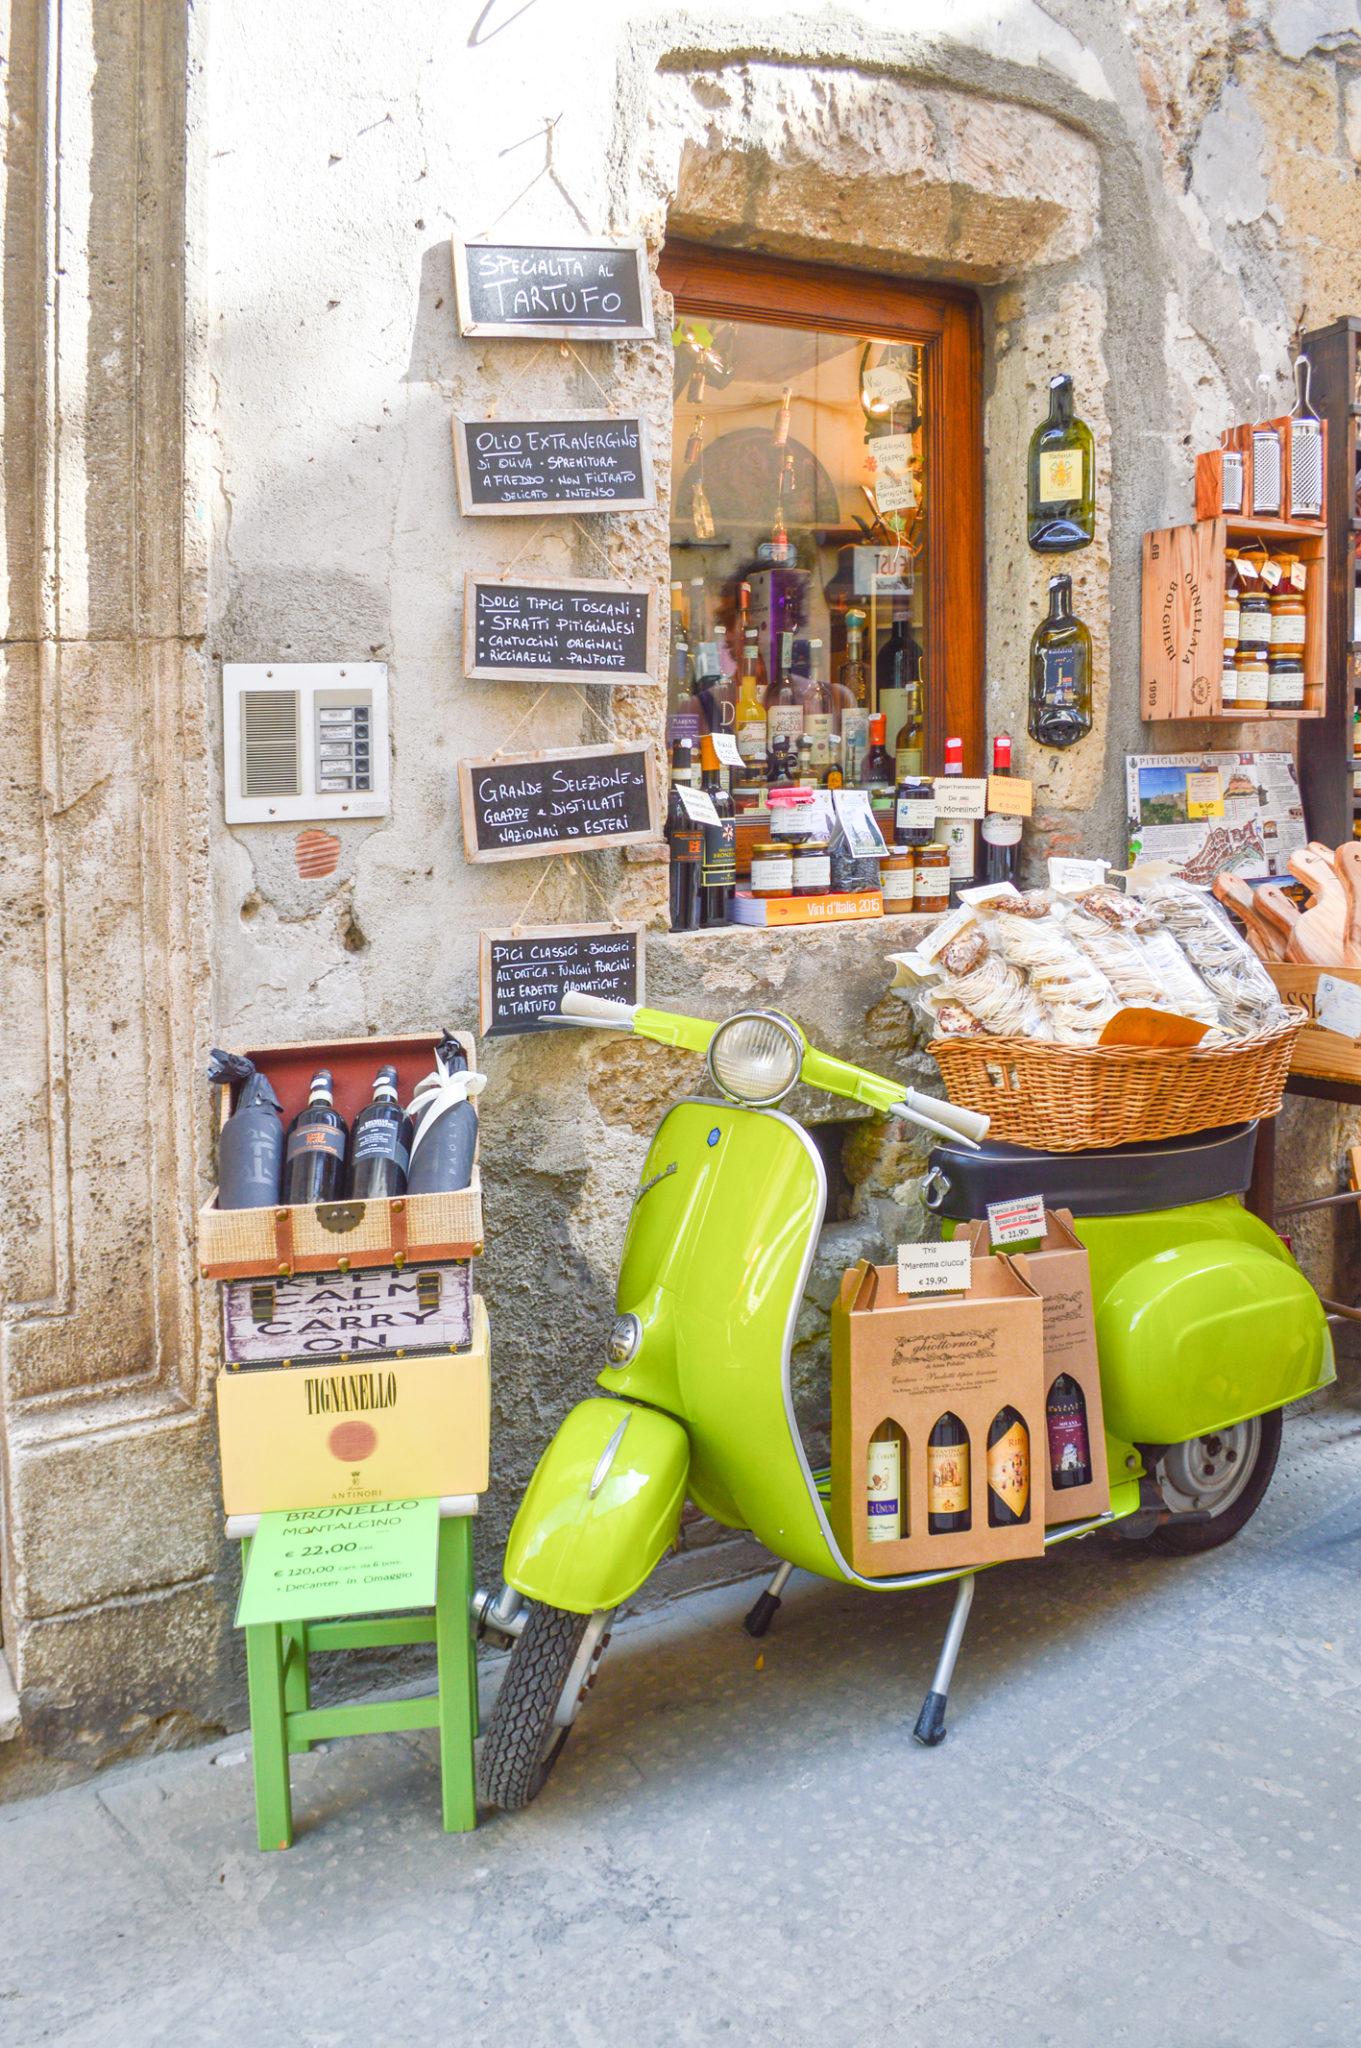 117 #WhereToGo: Pitigliano (Toscana)